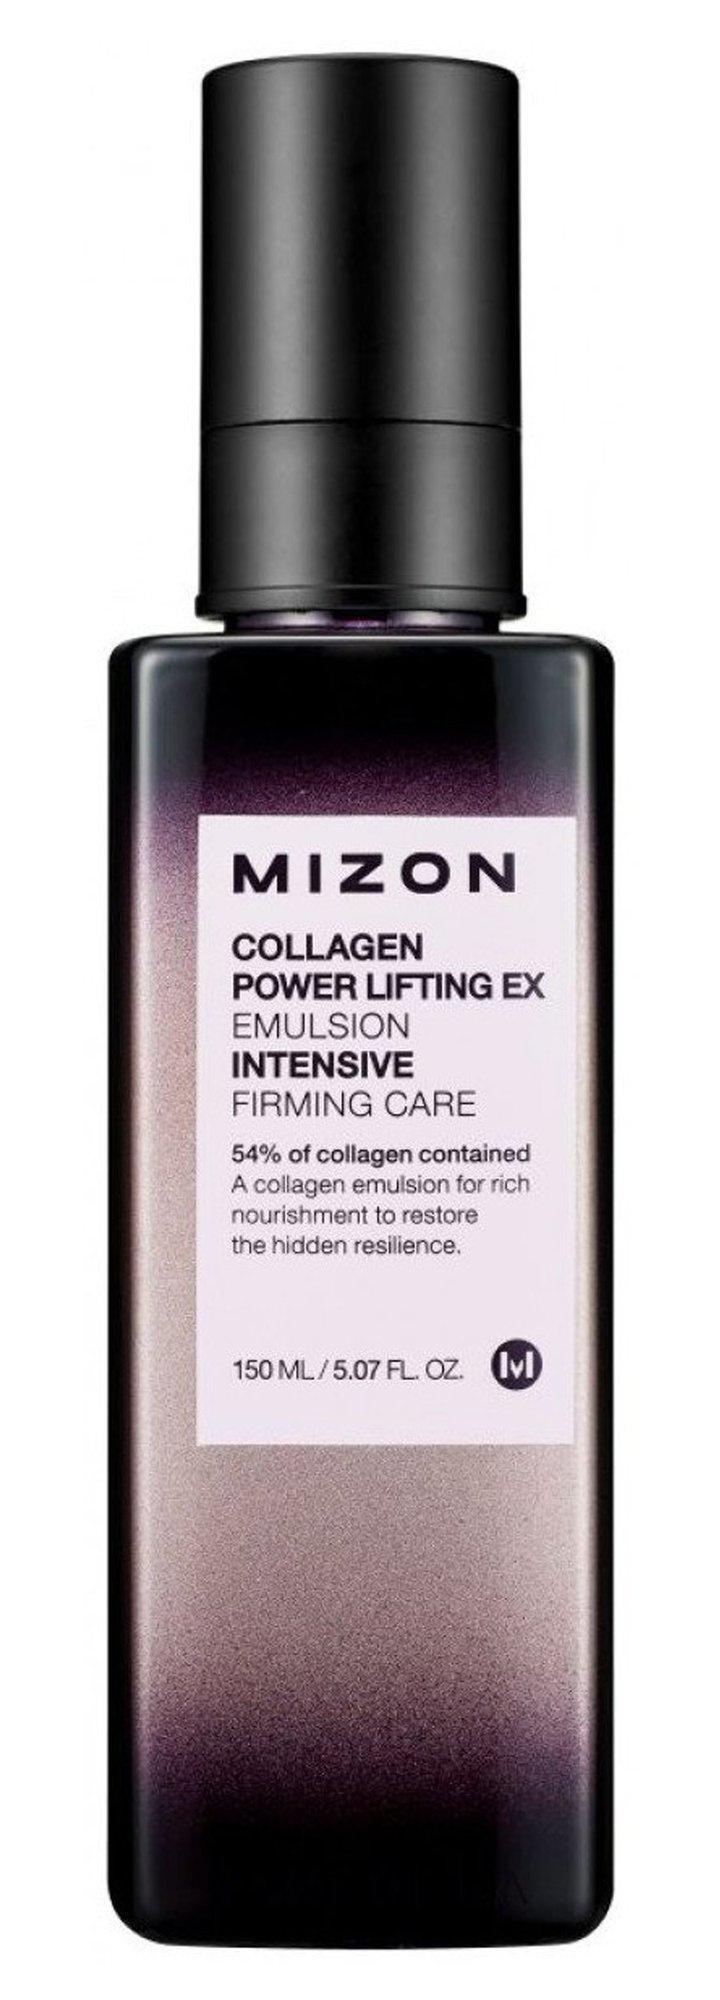 Mizon Collagen Power Lifting Ex Emulsion